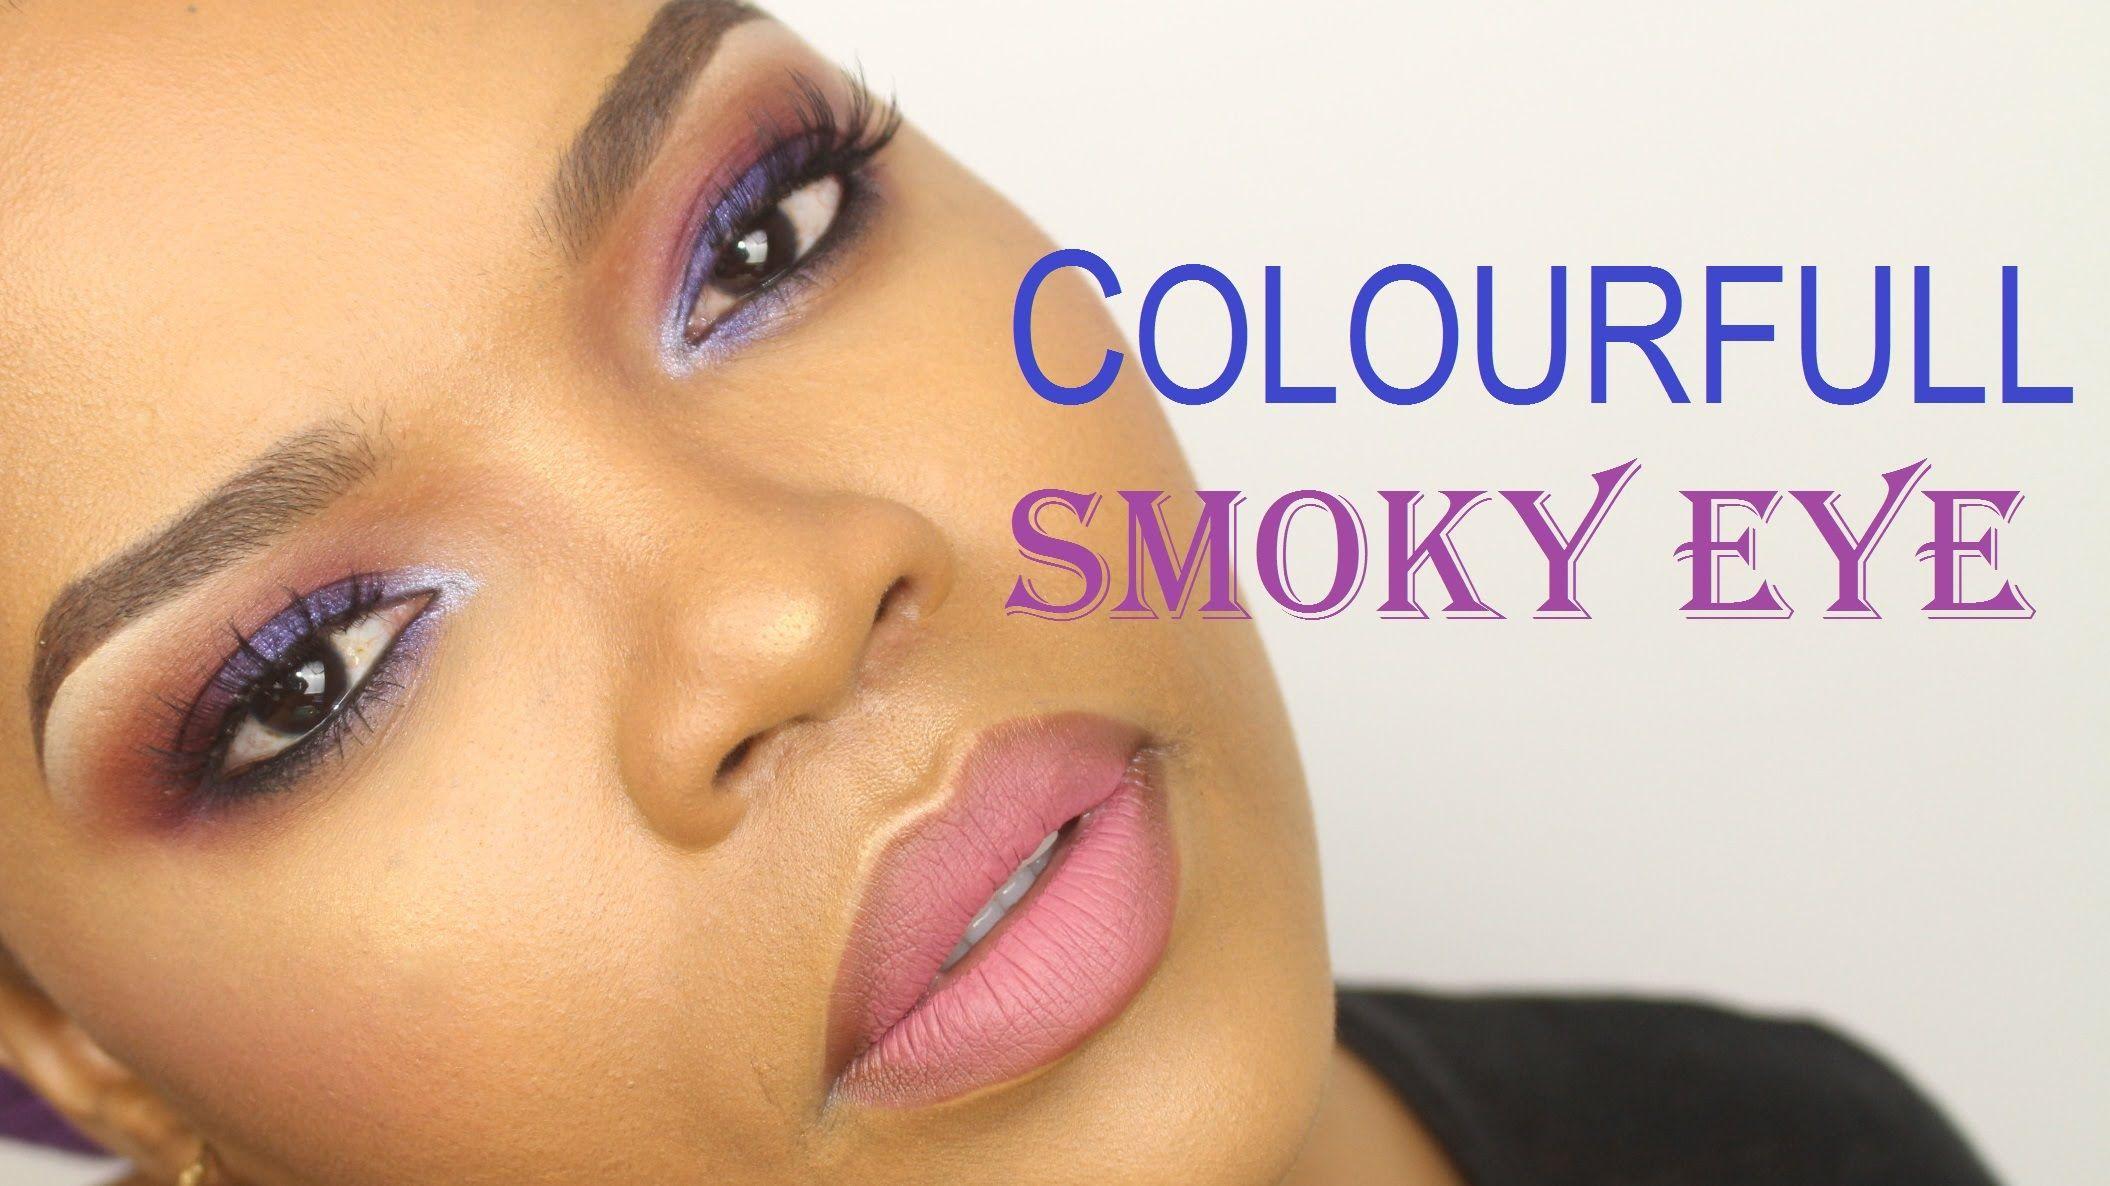 Smoky Eye Coloré w/Palette Enchanted Forest SLEEK